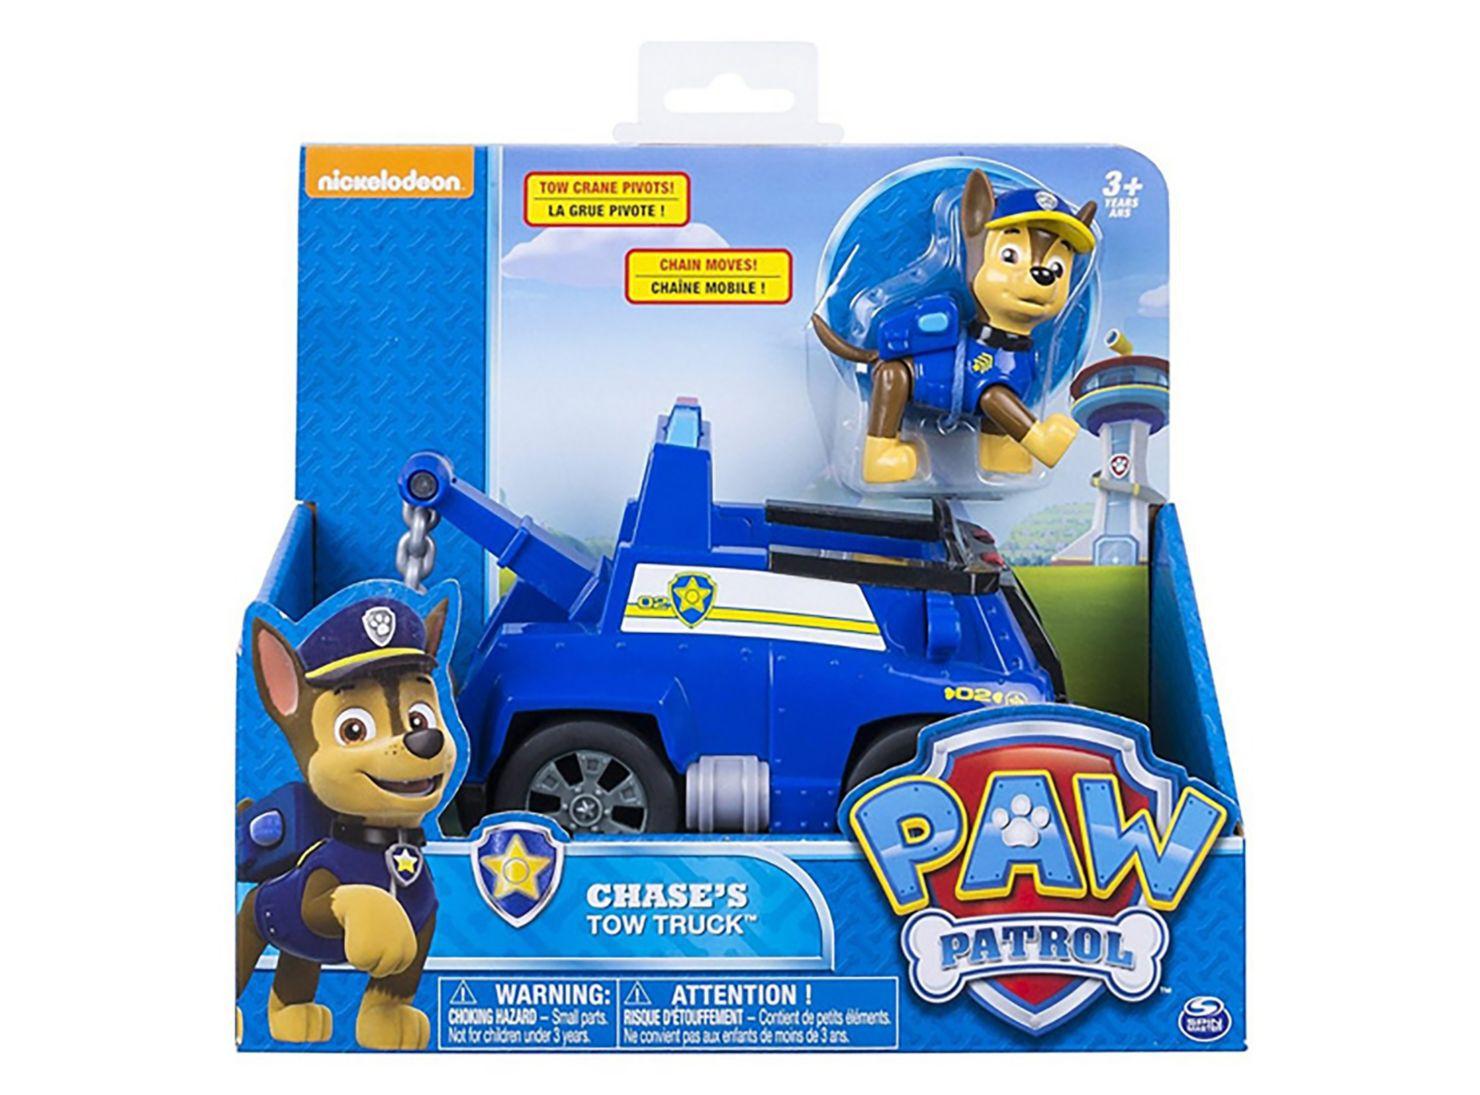 Auto Juguetes NiñosParis Figura Chase Patrol En Otros Policía Paw I7mbfyv6gY